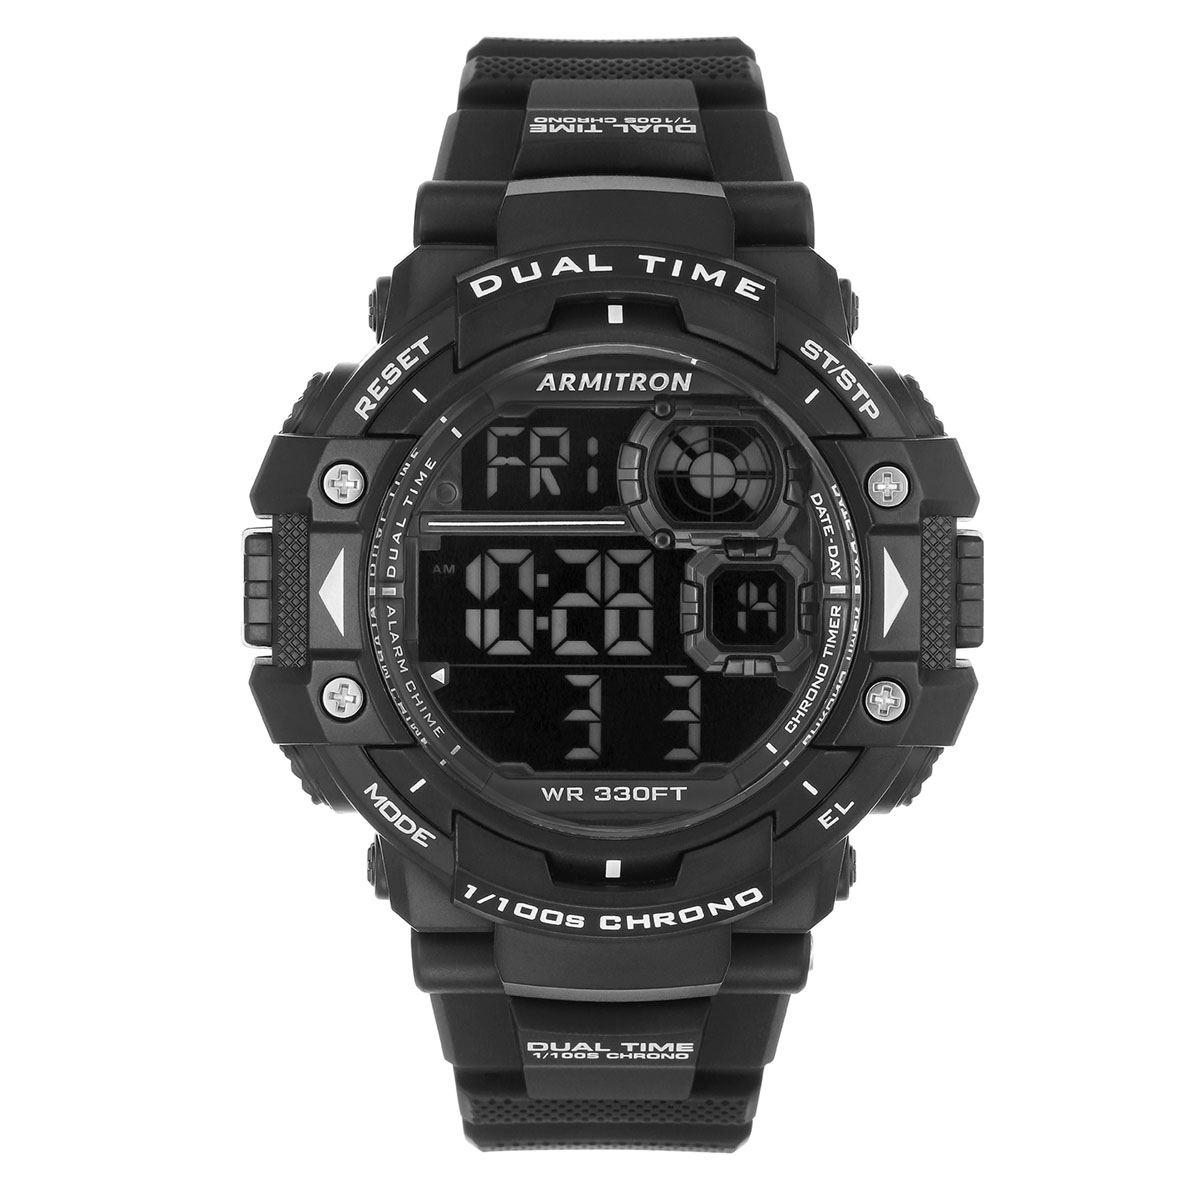 Reloj armitron pro sport  caballeros 408309blk  - Sanborns